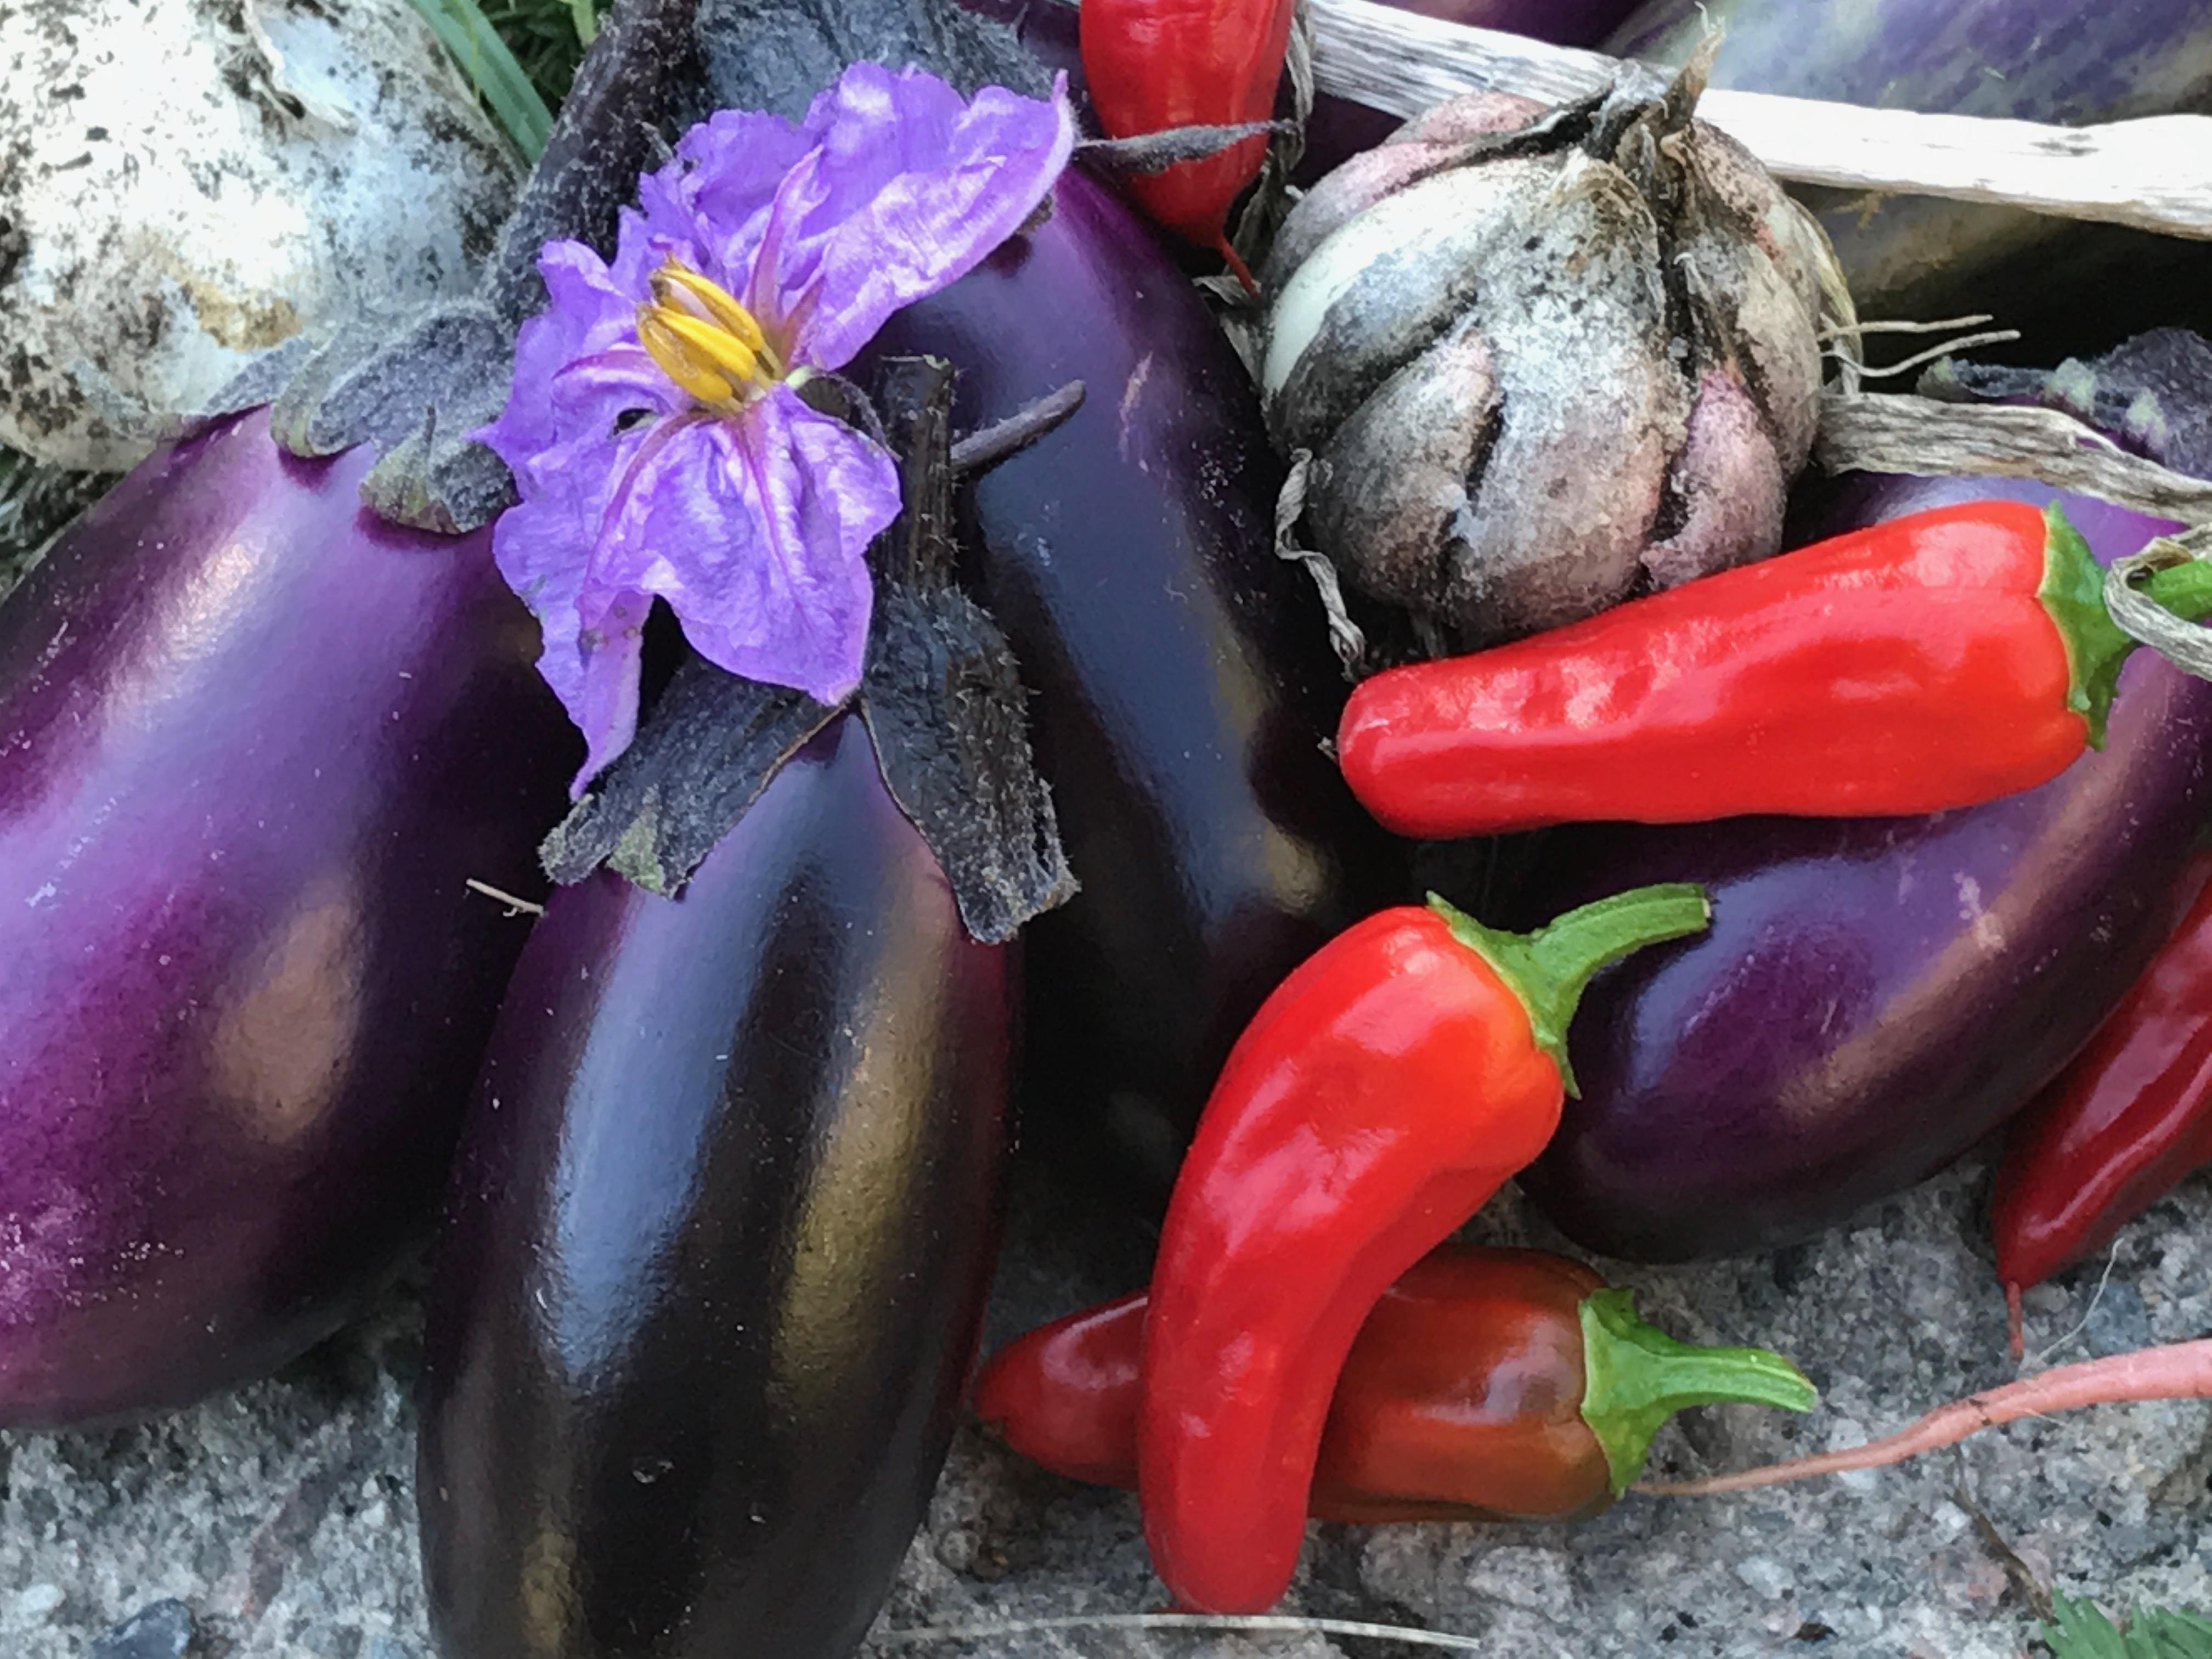 Auberginer, vitlök & chili